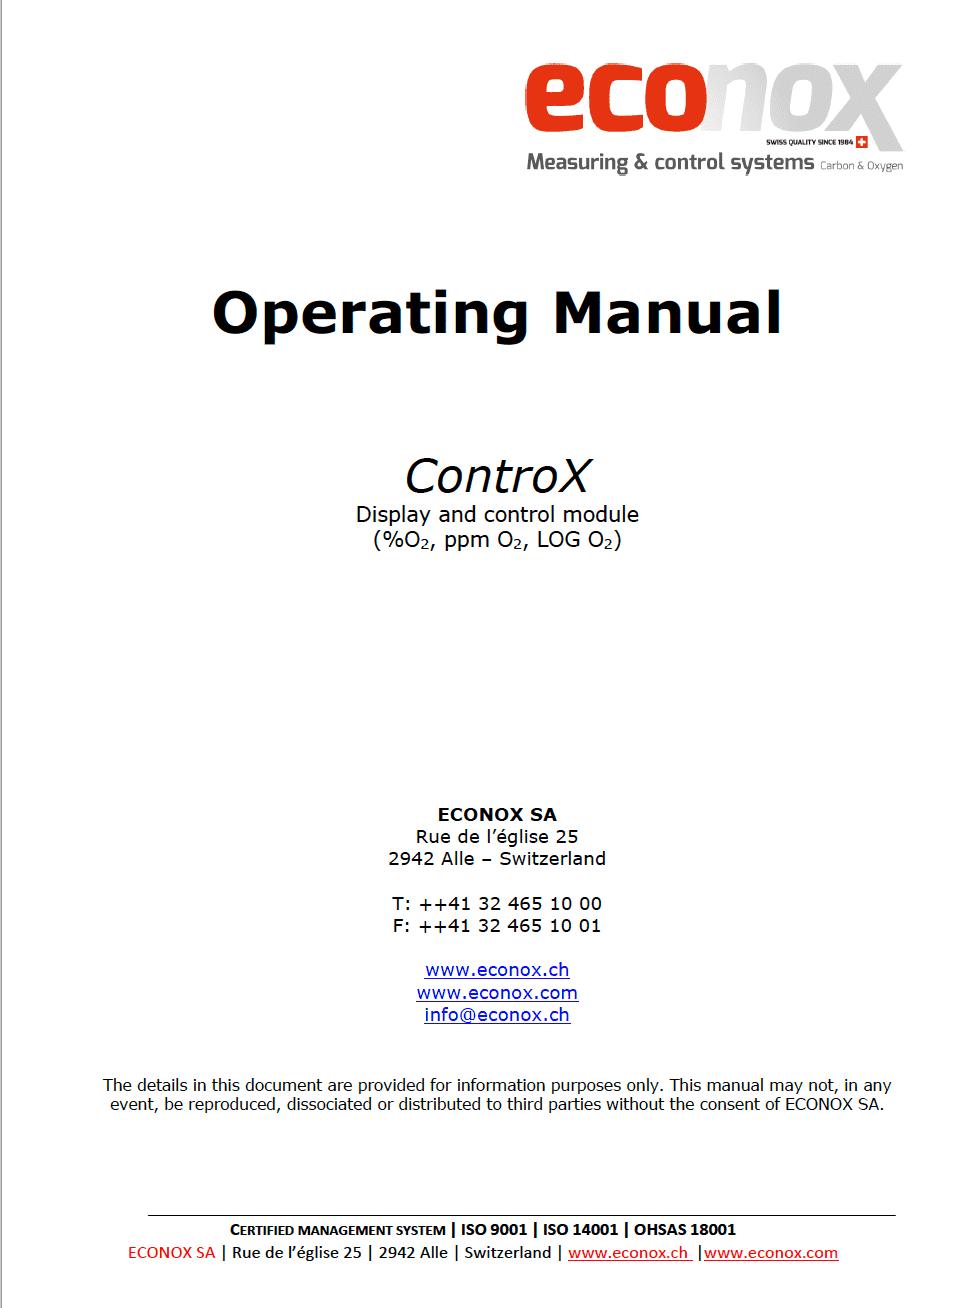 Mode d'emploi controX